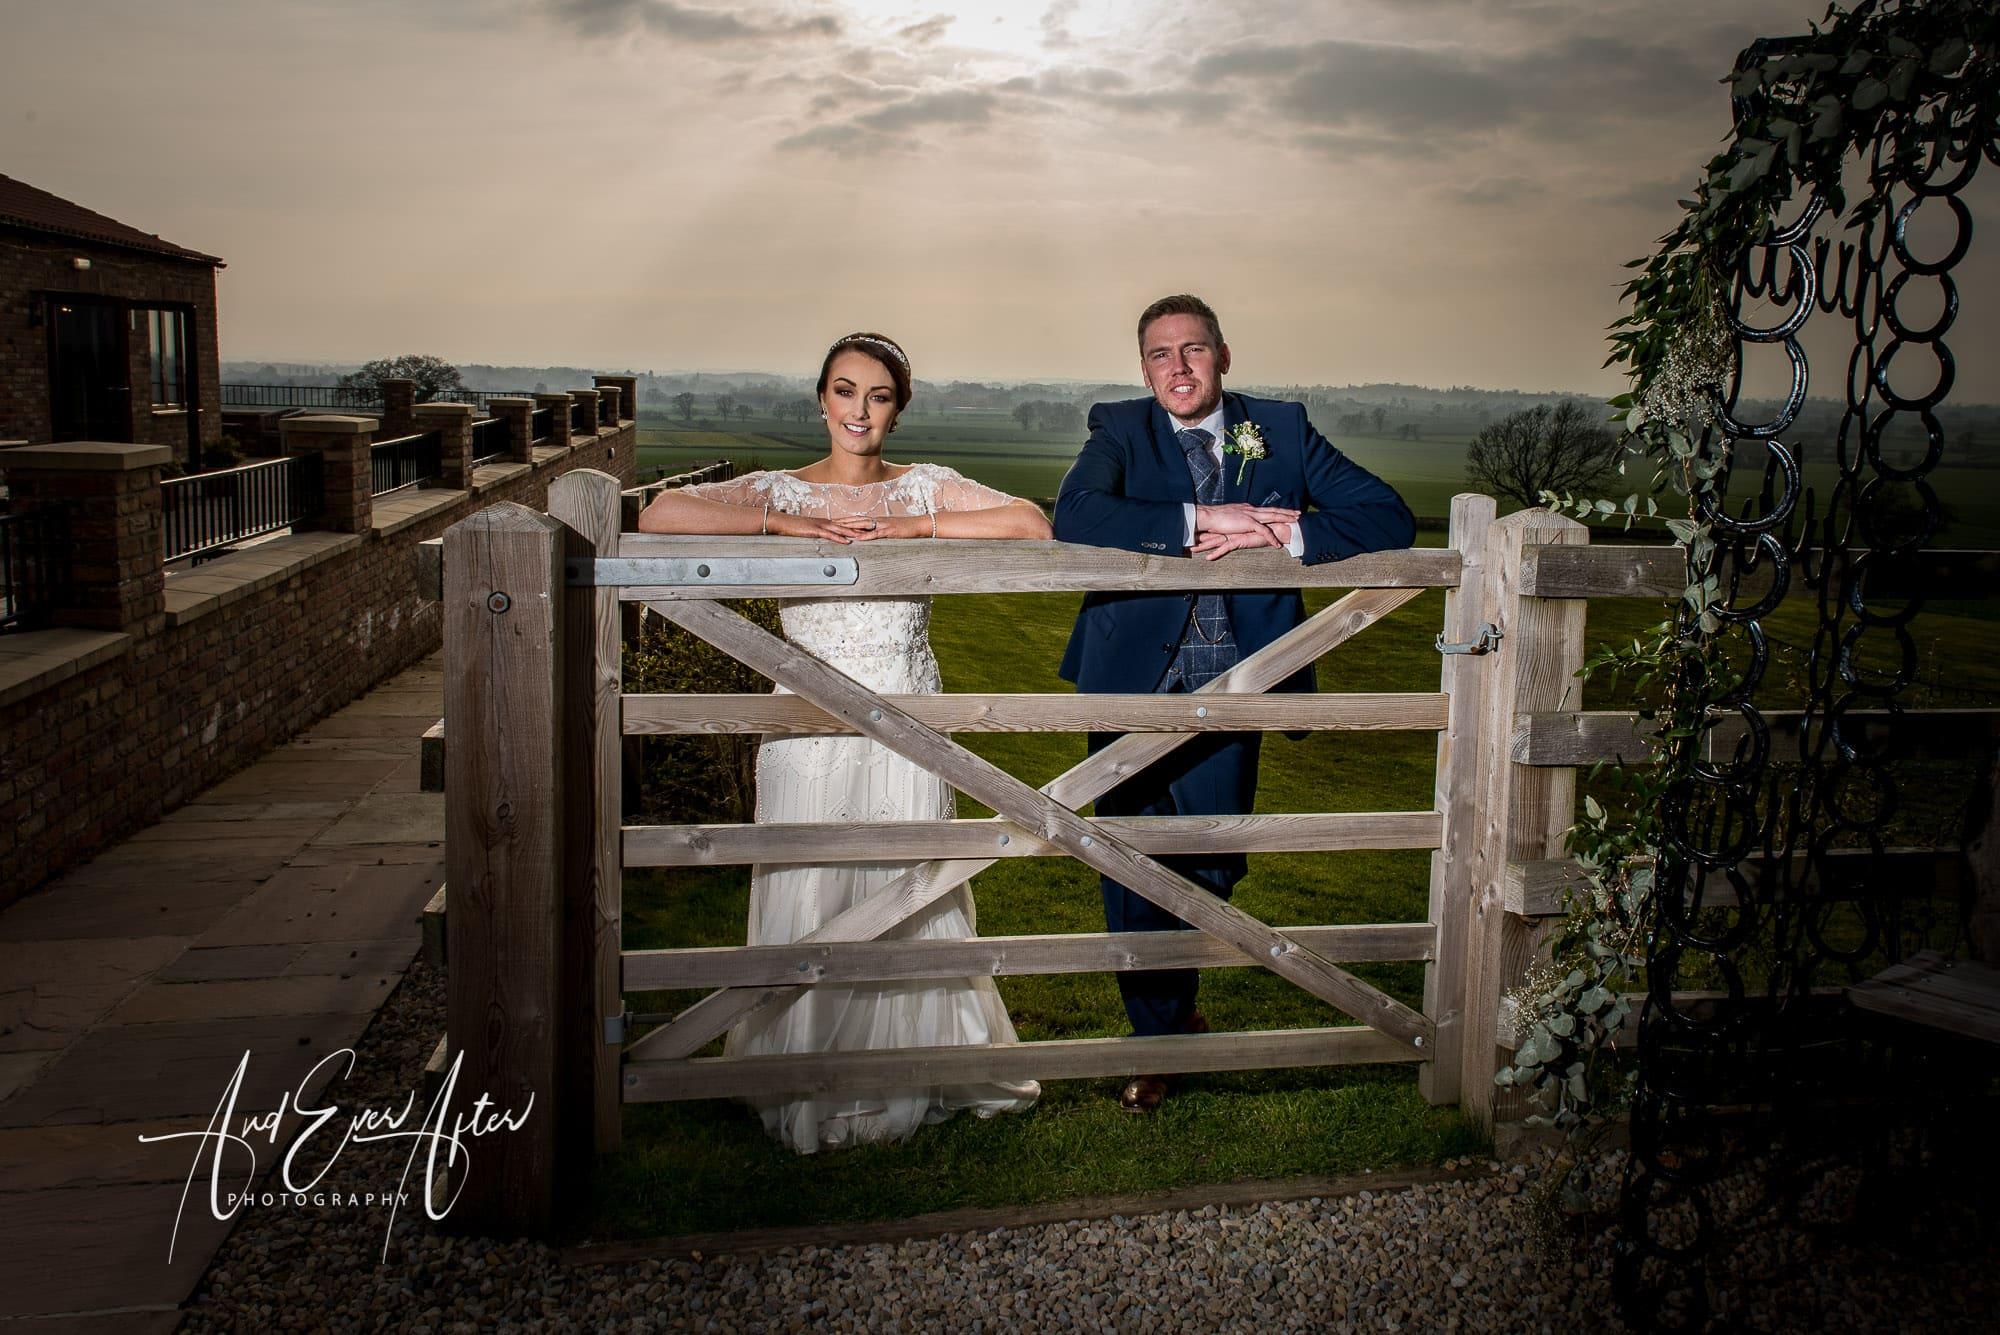 bride, groom, wedding day, love, sunset